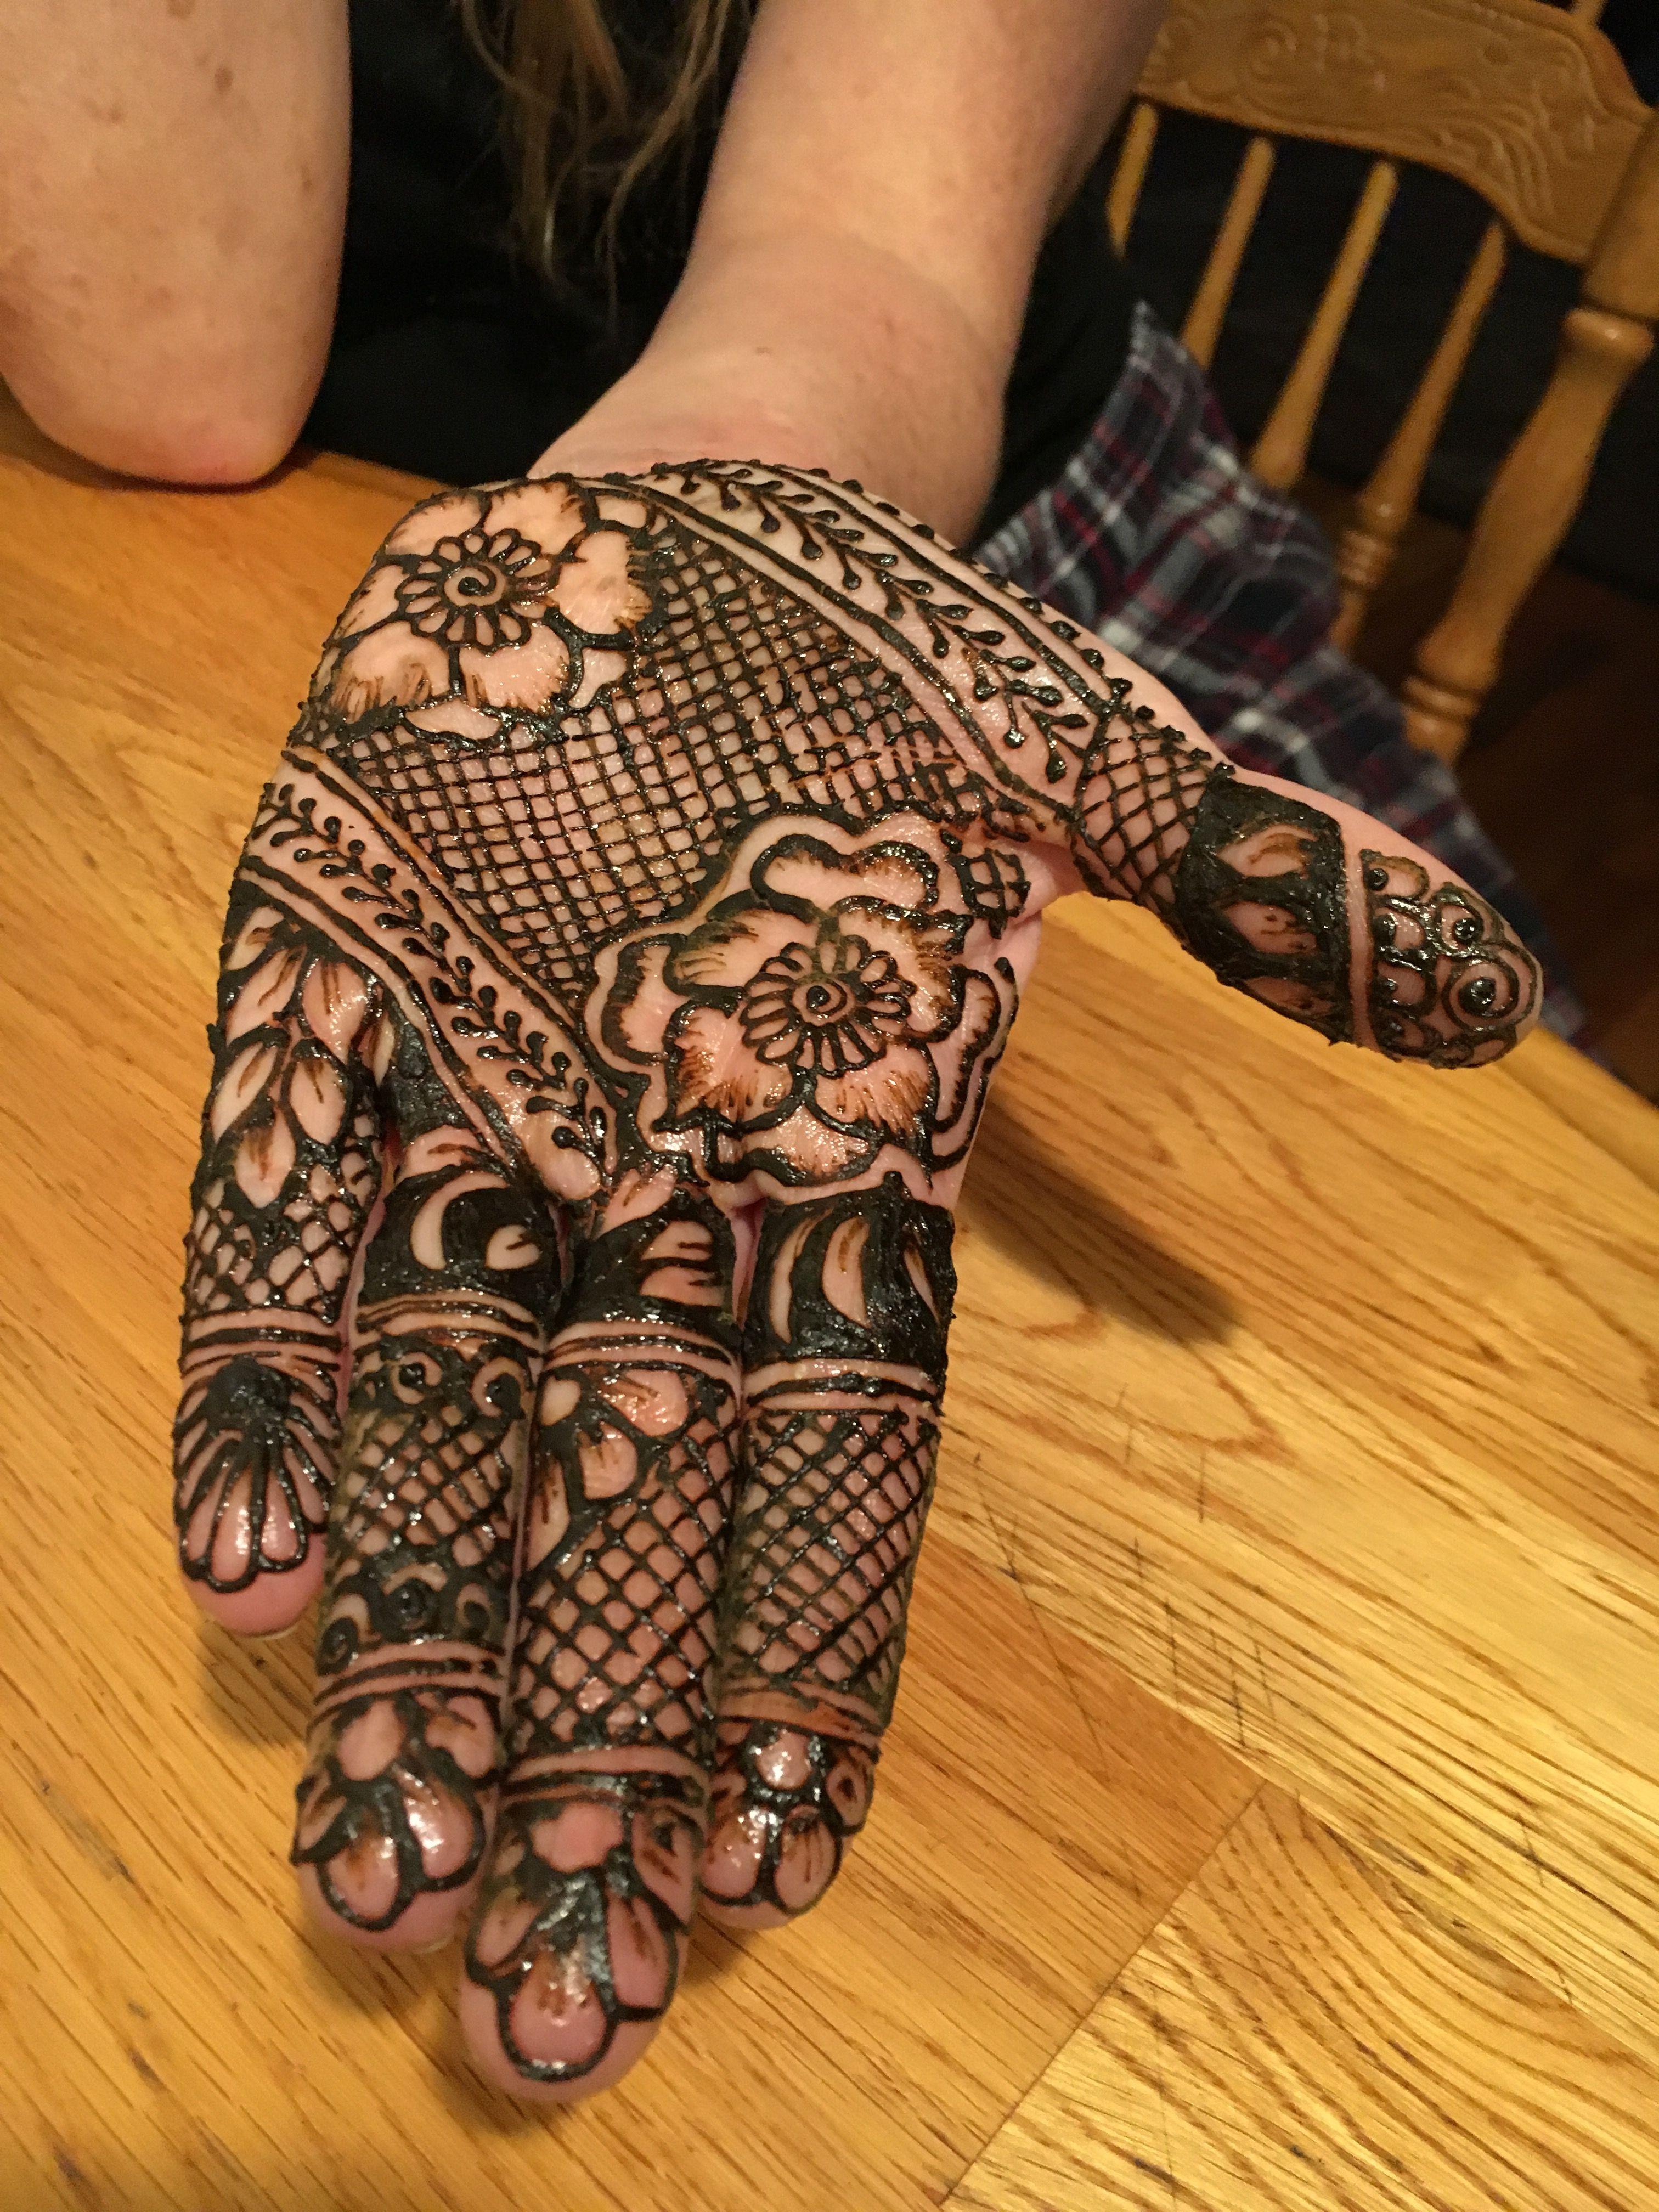 Mehndi Designs Patterns Ideas : Pin by aliyah ali on henna tattoos hennas mehndi